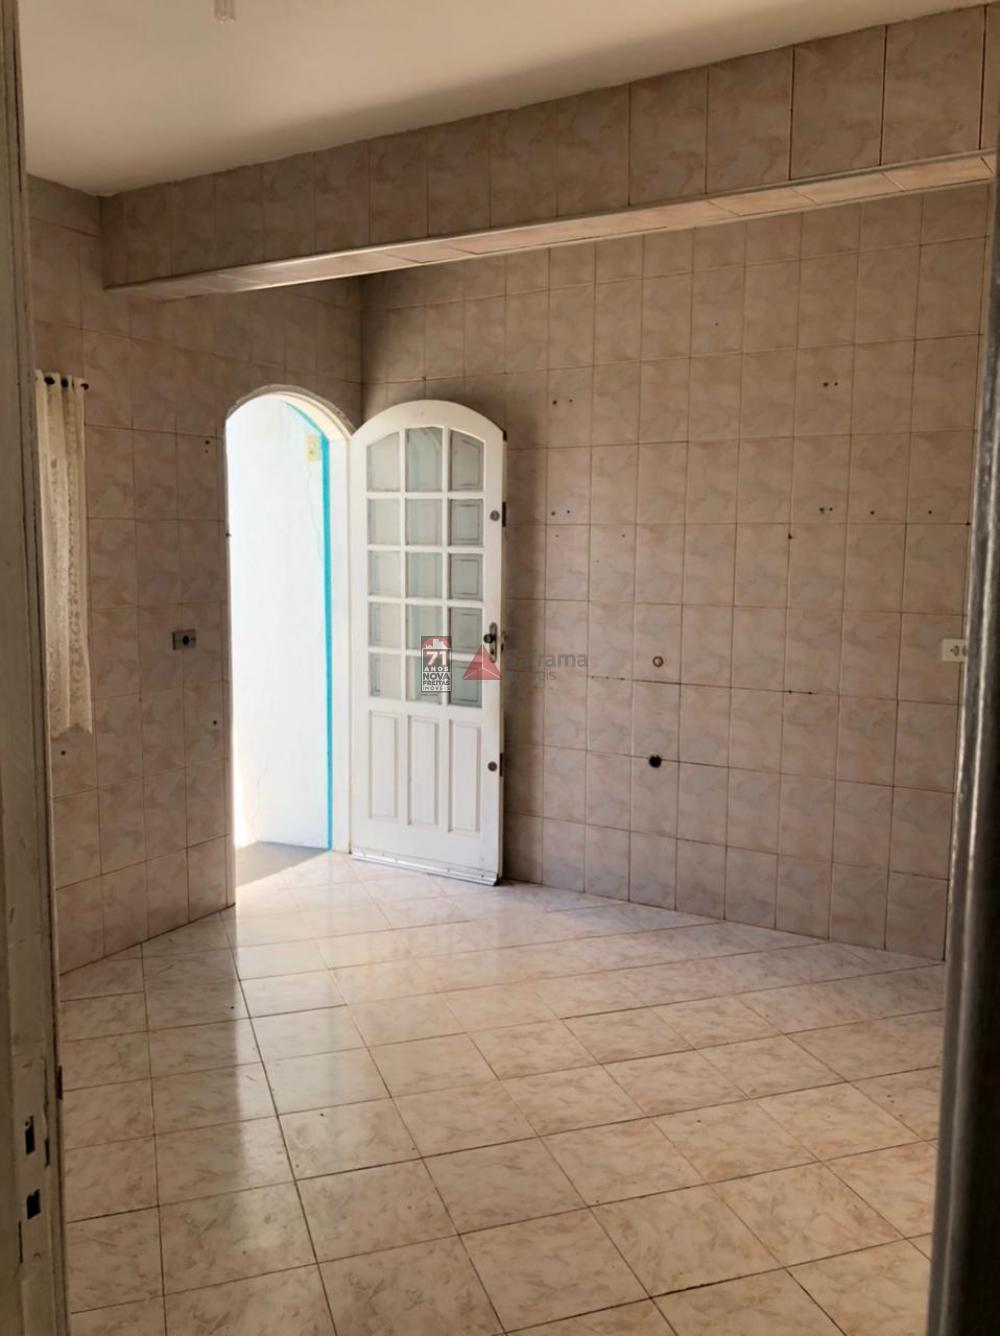 Comprar Casa / Padrão em Pindamonhangaba R$ 180.000,00 - Foto 5